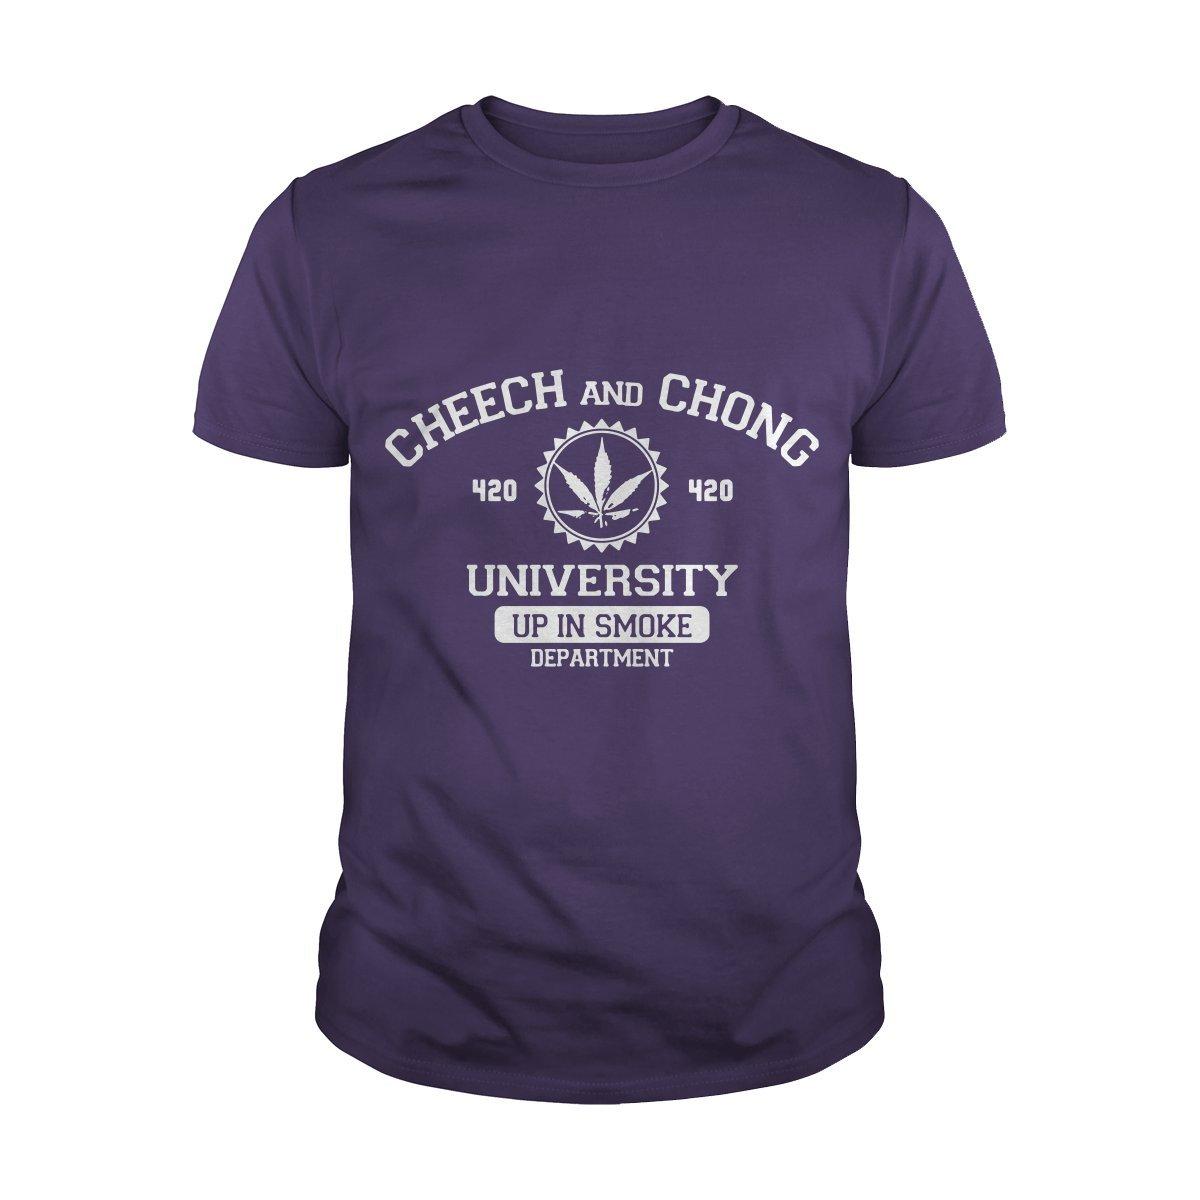 Guys Tee Purple XLarge Cheech and Chong University TShirt